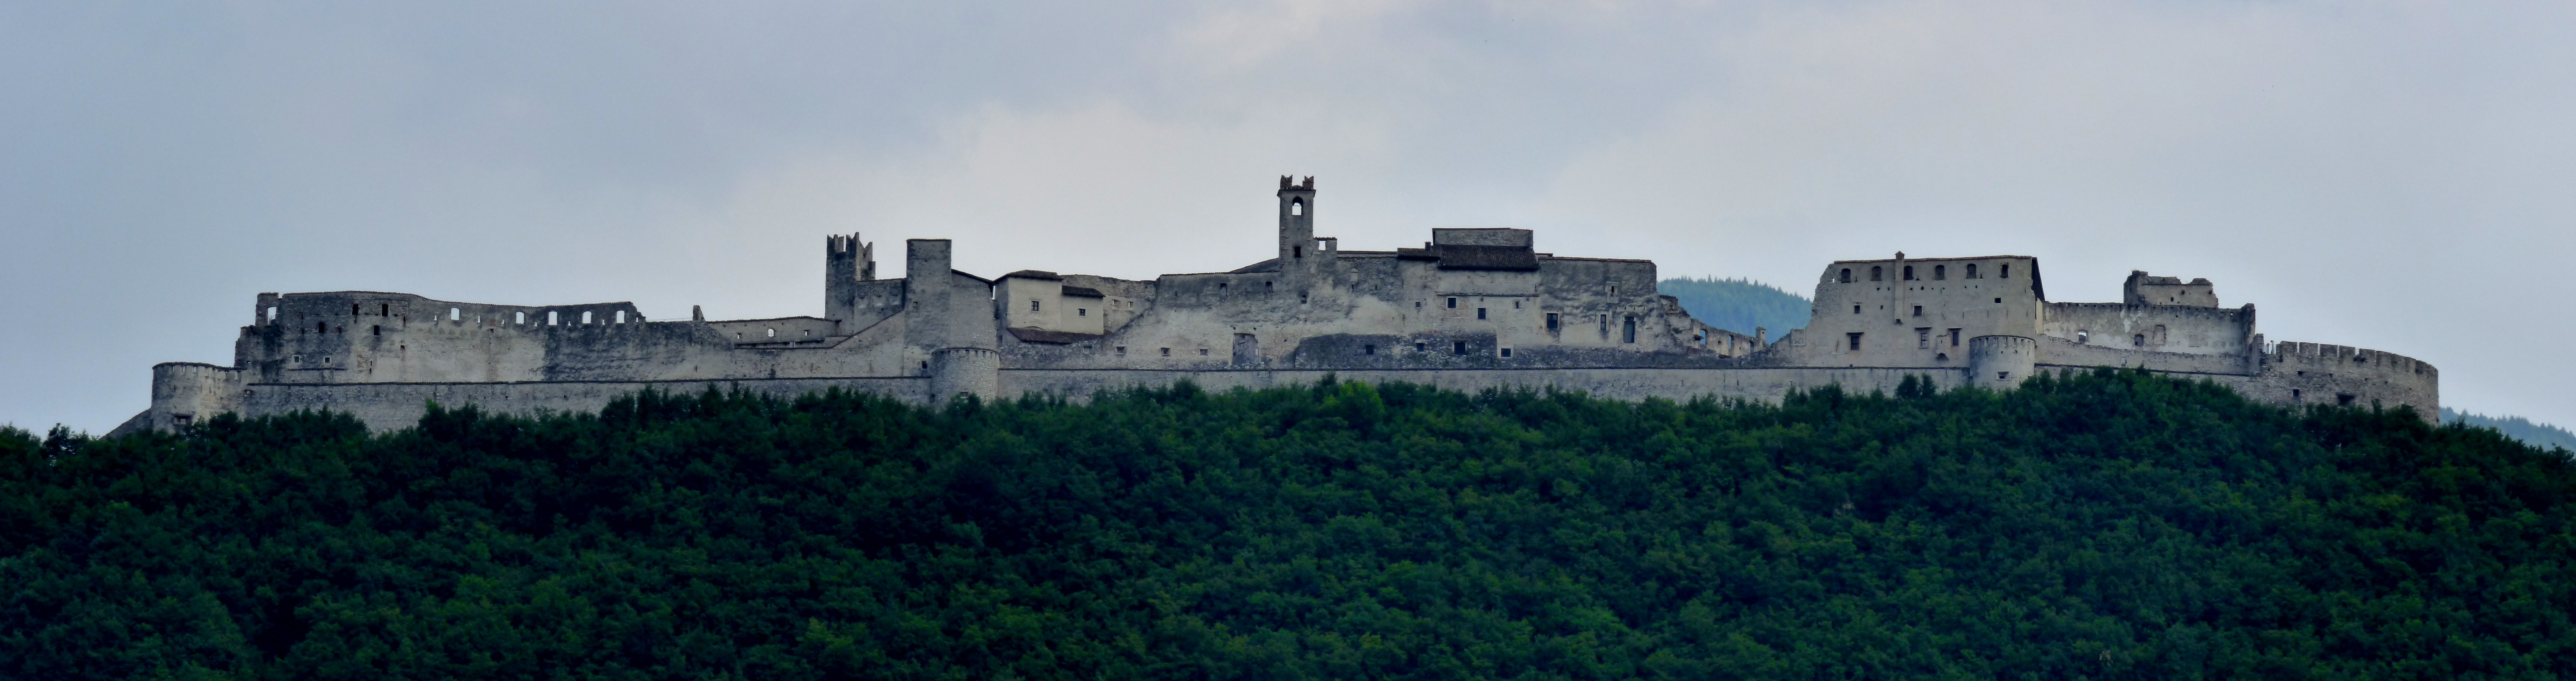 castel deseno